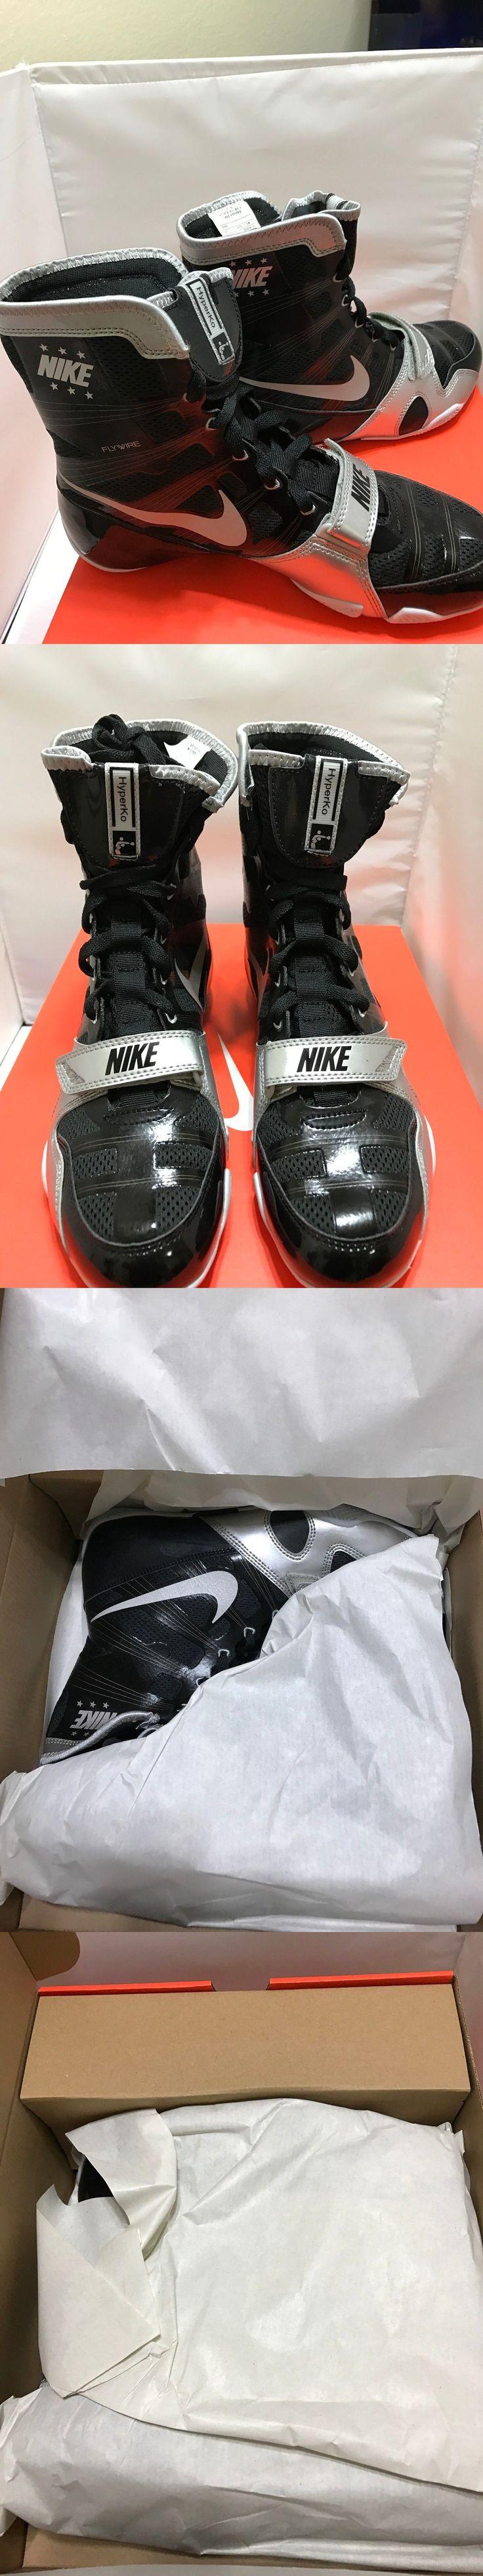 Men Shoes: New Nike Hyperko Boxing Shoes - Black/Silver - Size 7.5 Us